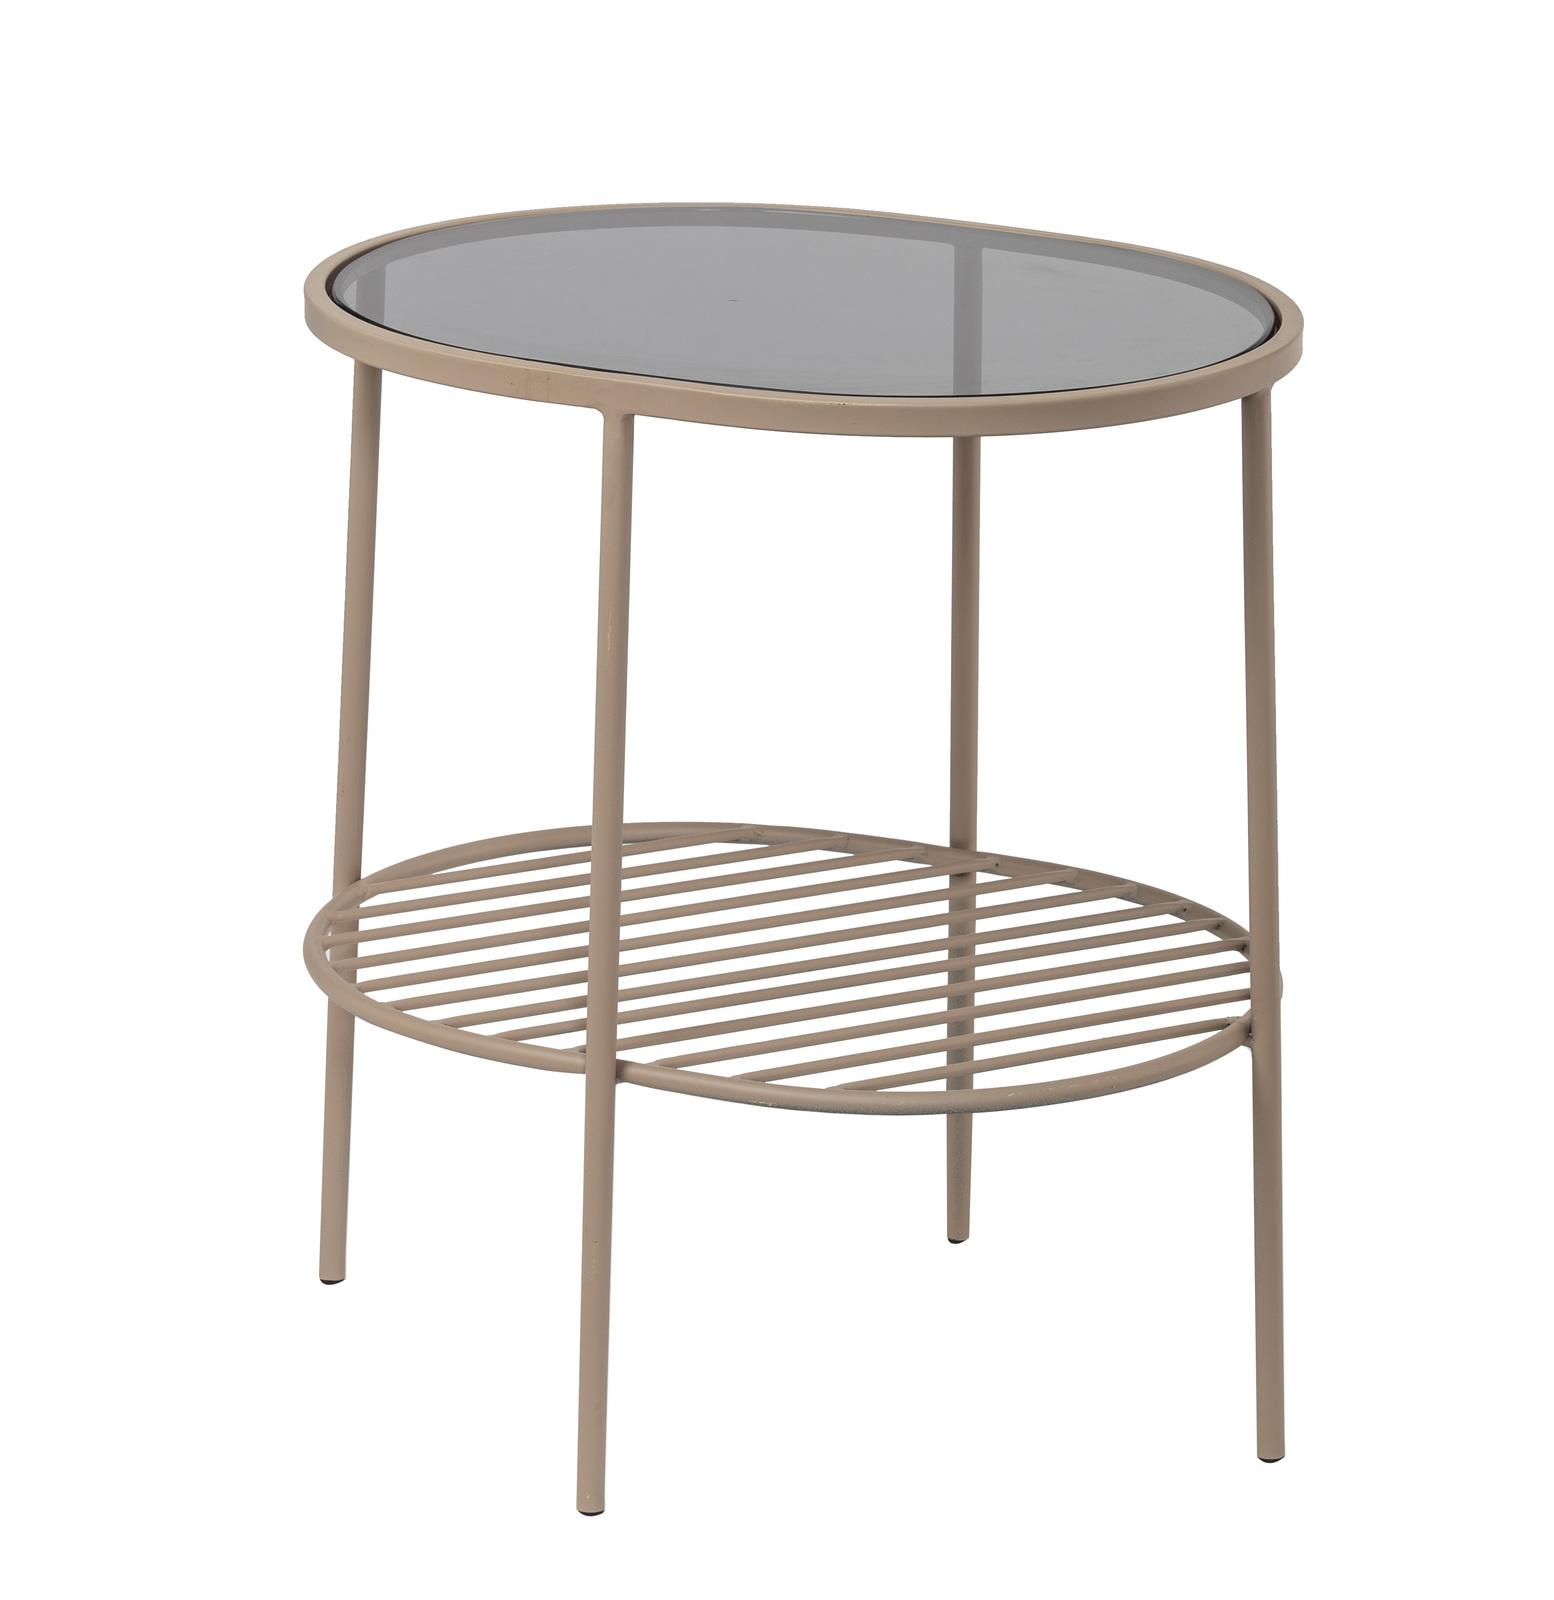 Amalfi: Aili Side Table (45x35.5x50cm) image